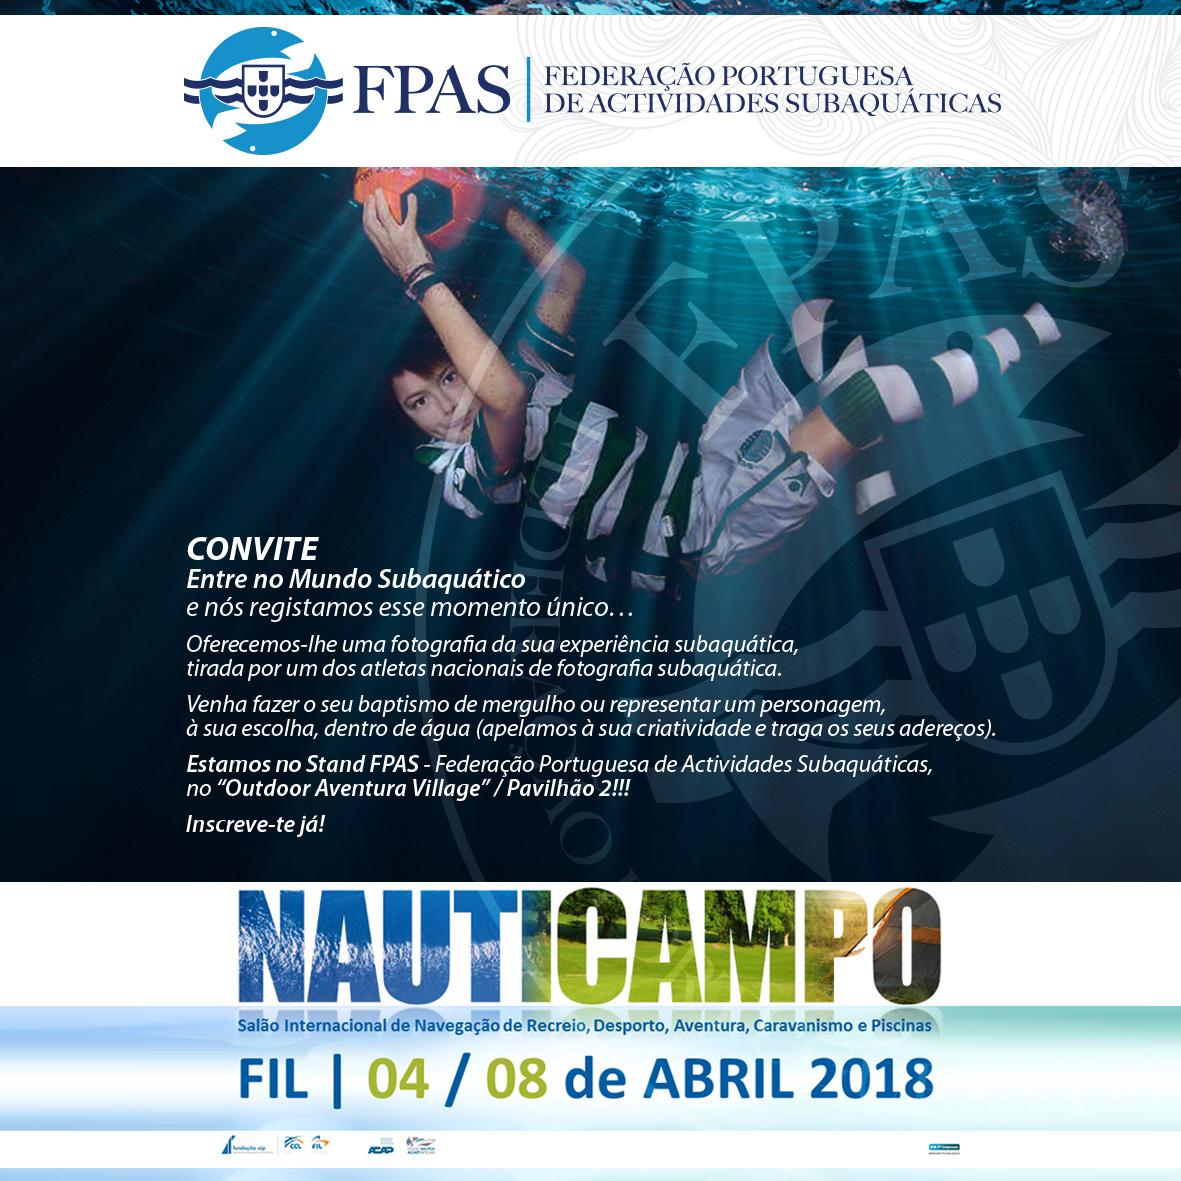 fpas_convitenauticampo_vr.jpg